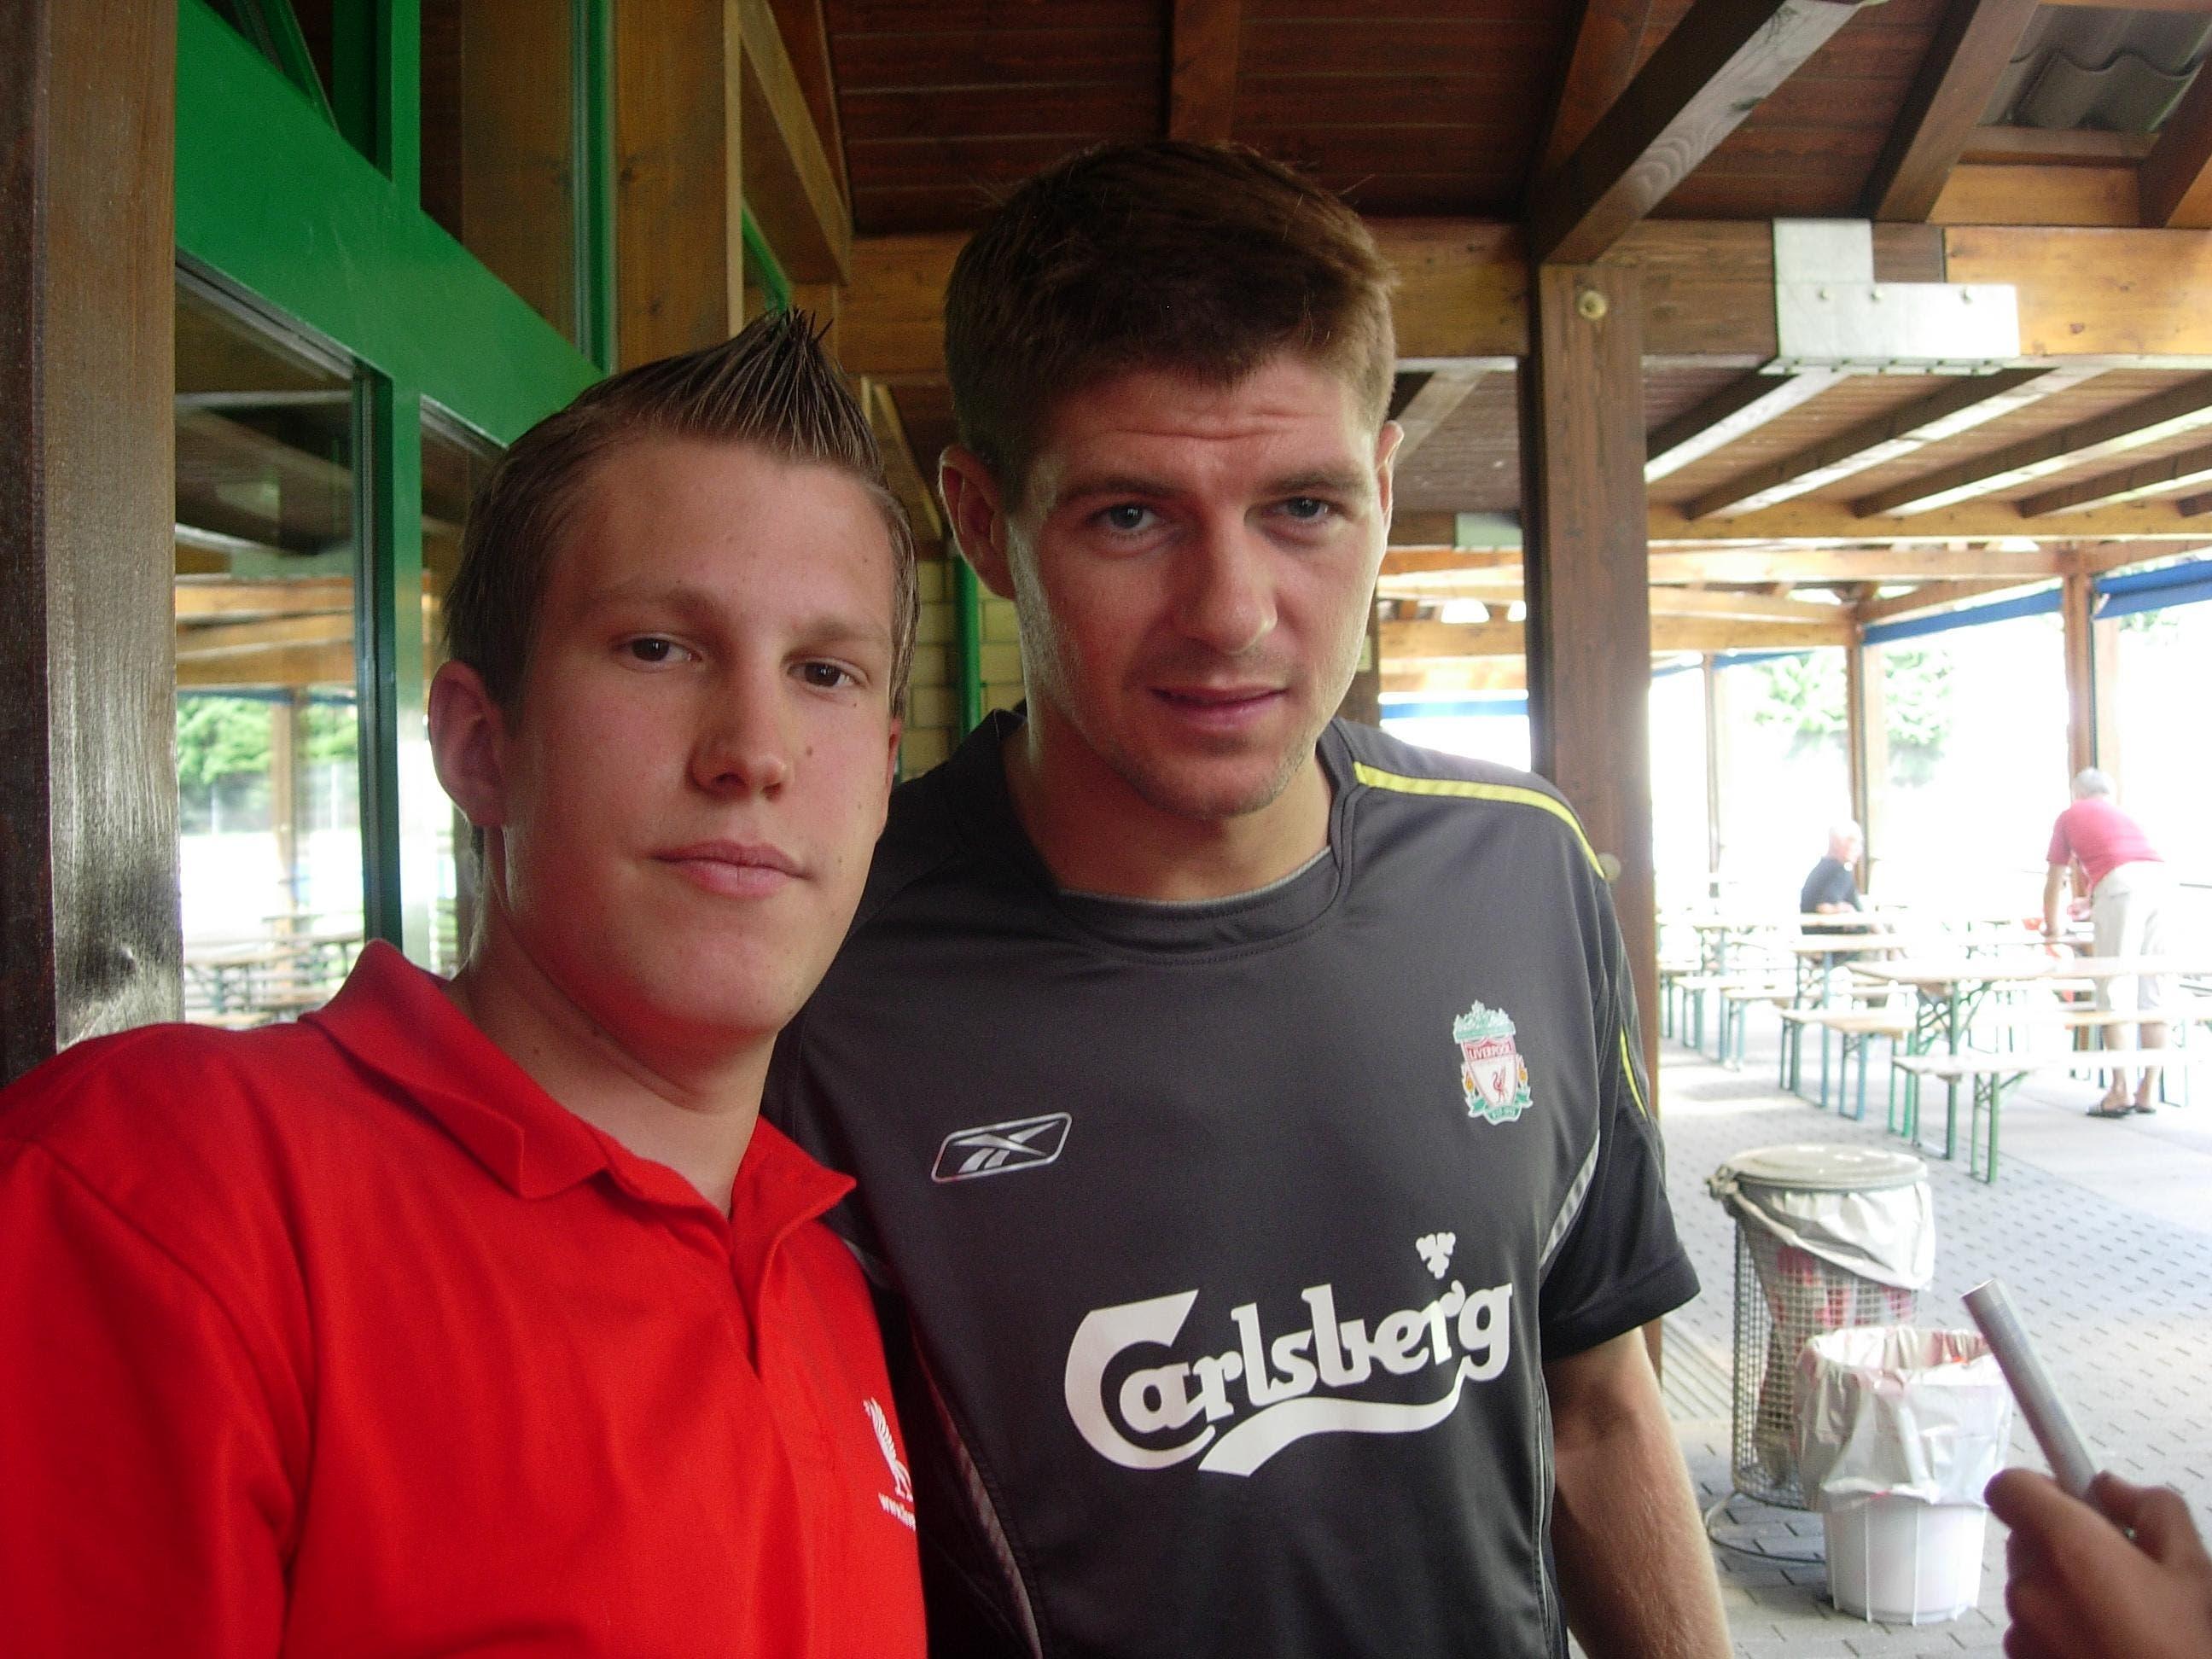 Reto Brunner mit Liverpool-Legende Steven Gerard 2005 in Bad Ragaz.